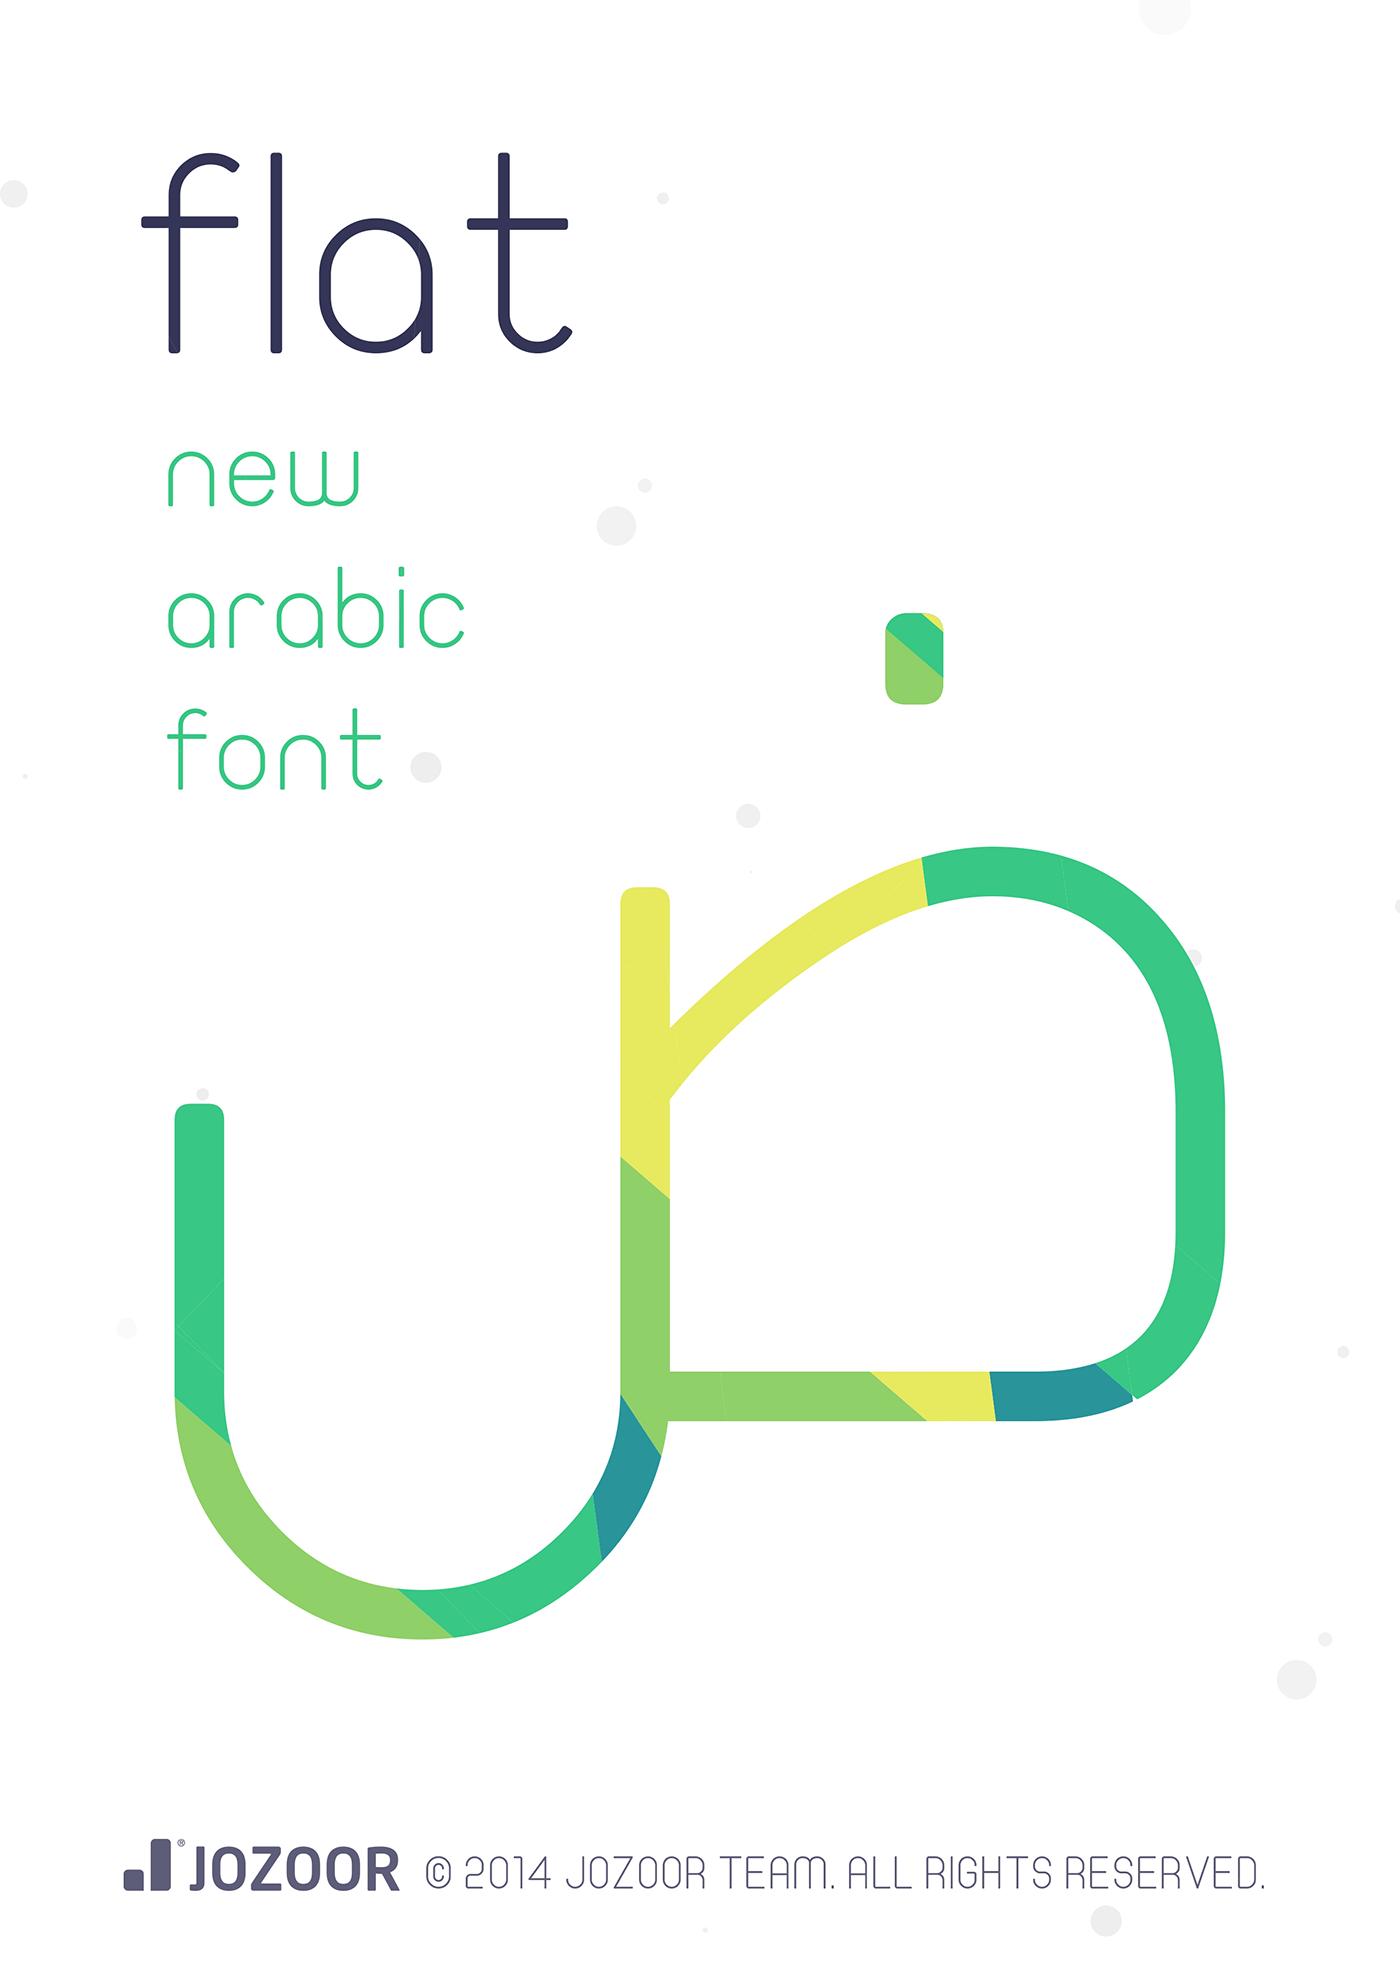 Flat Font خط فلات خط فلات خط عربى جديد من تصميم وبرمجة